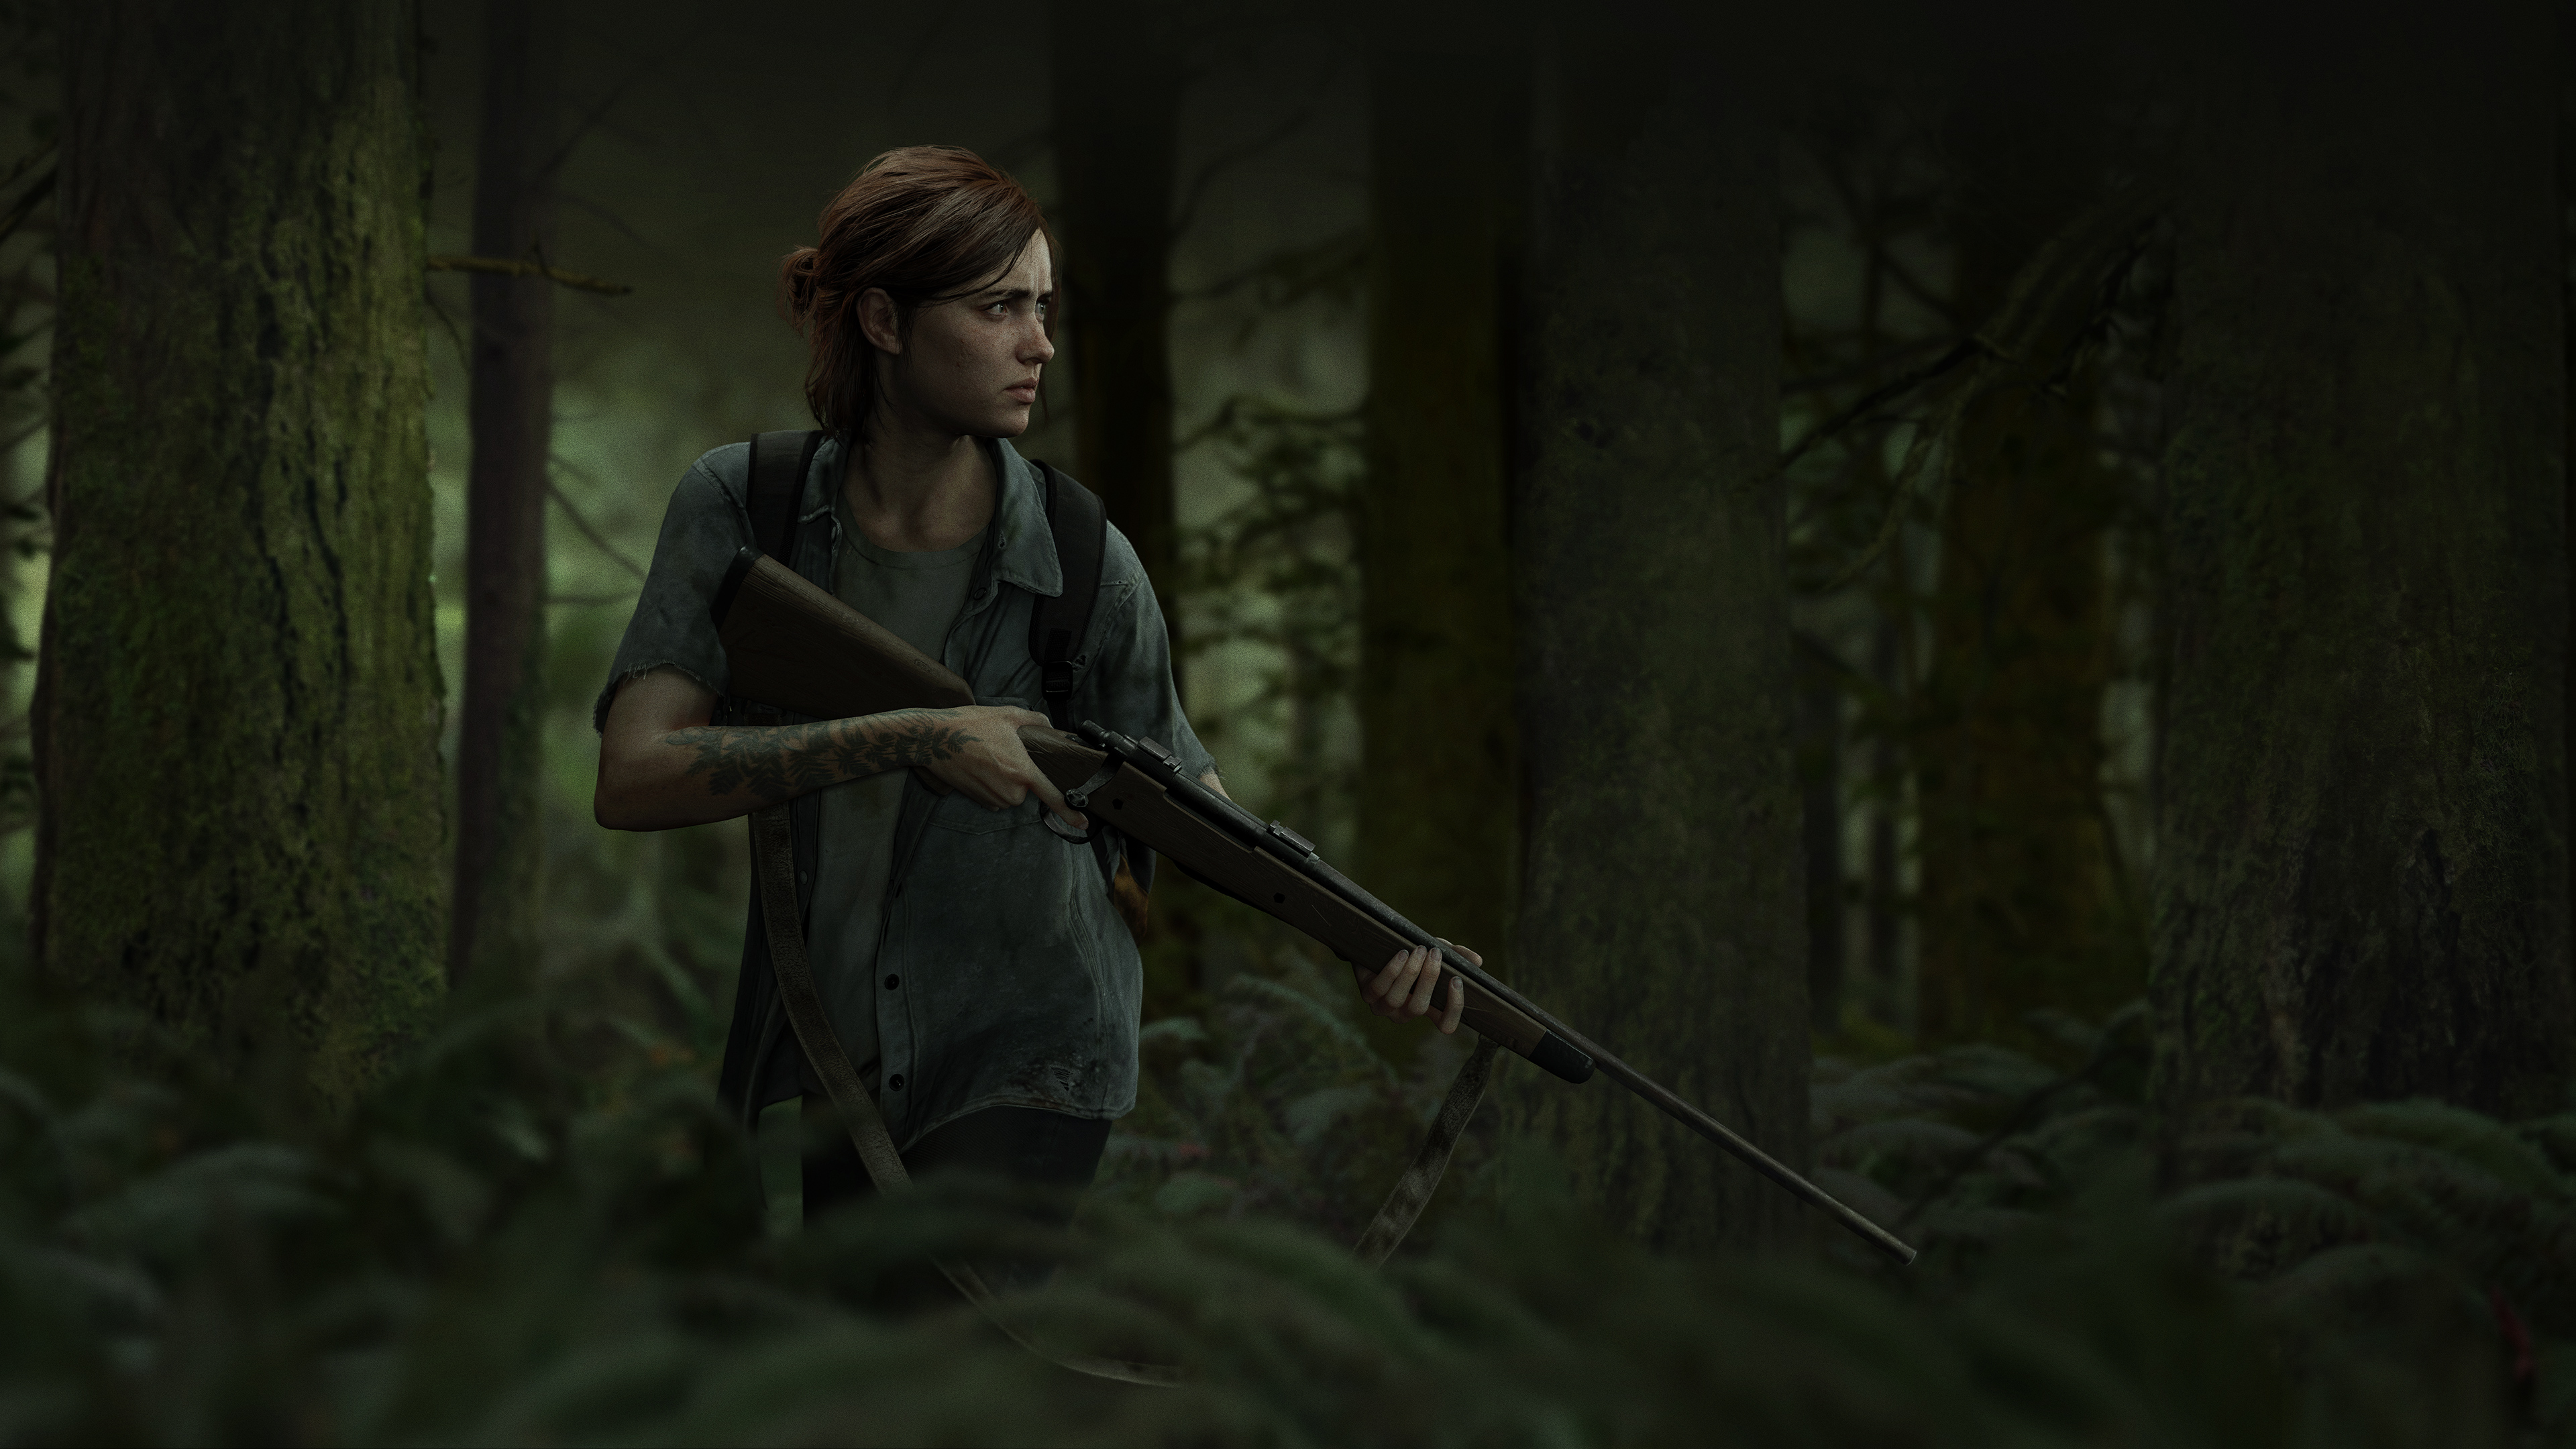 The Last Of Us Part Ii 4k Wallpaper Ellie Playstation 4 2020 Games Games 1877